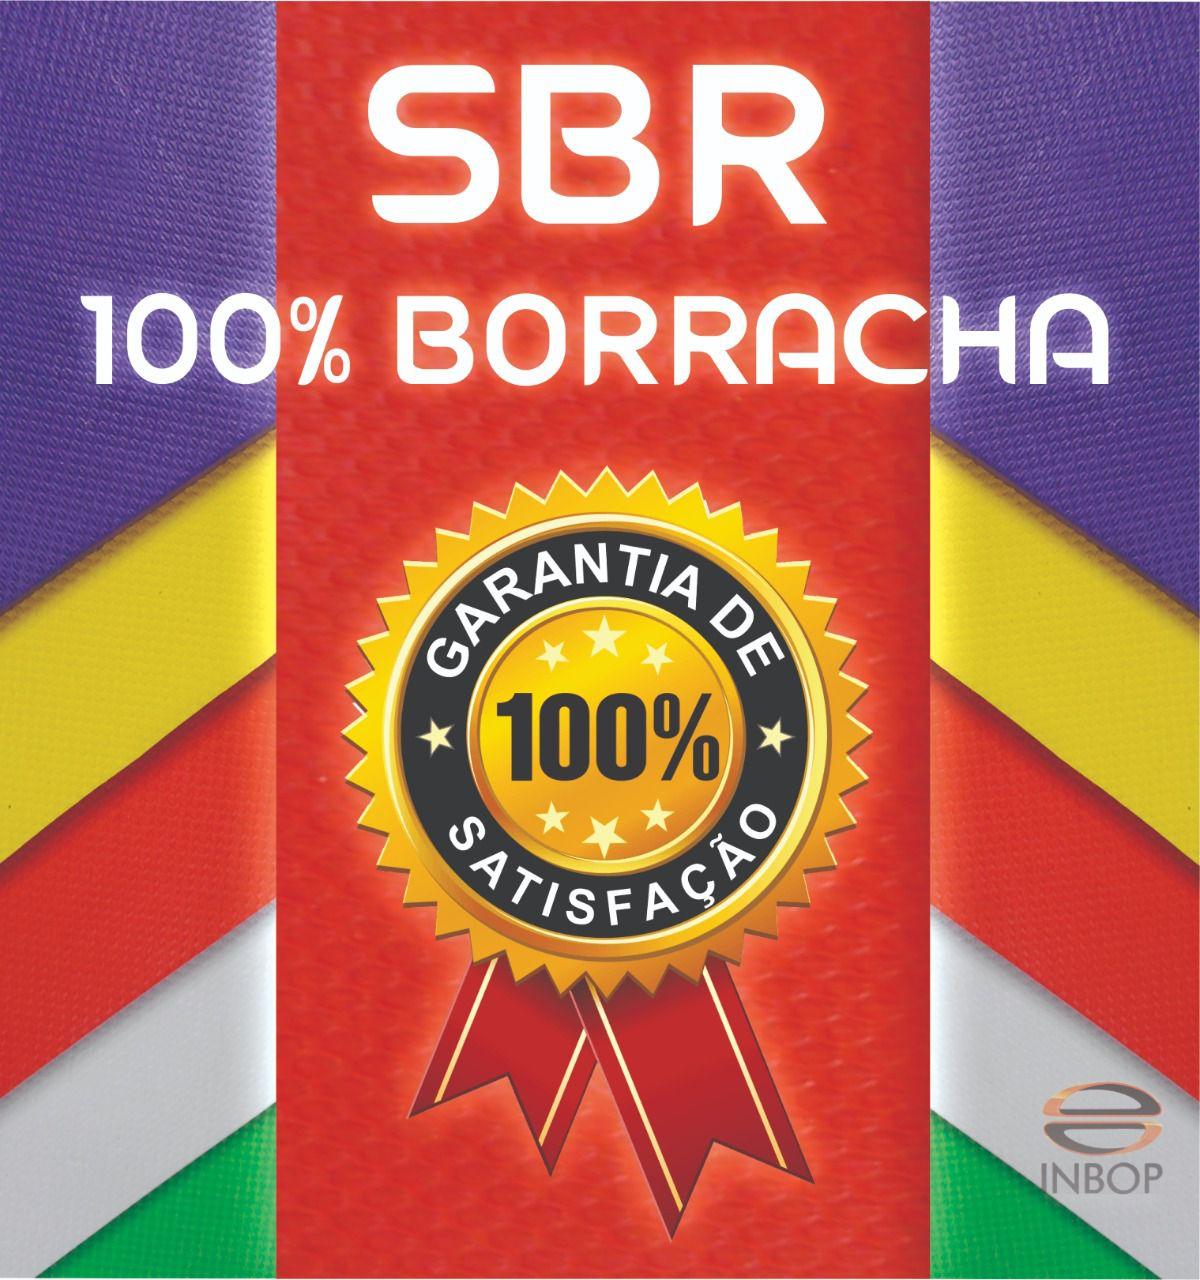 Placa 100% Borracha SBR RETA - 1,30 x 0,85 - Espessura 14MM